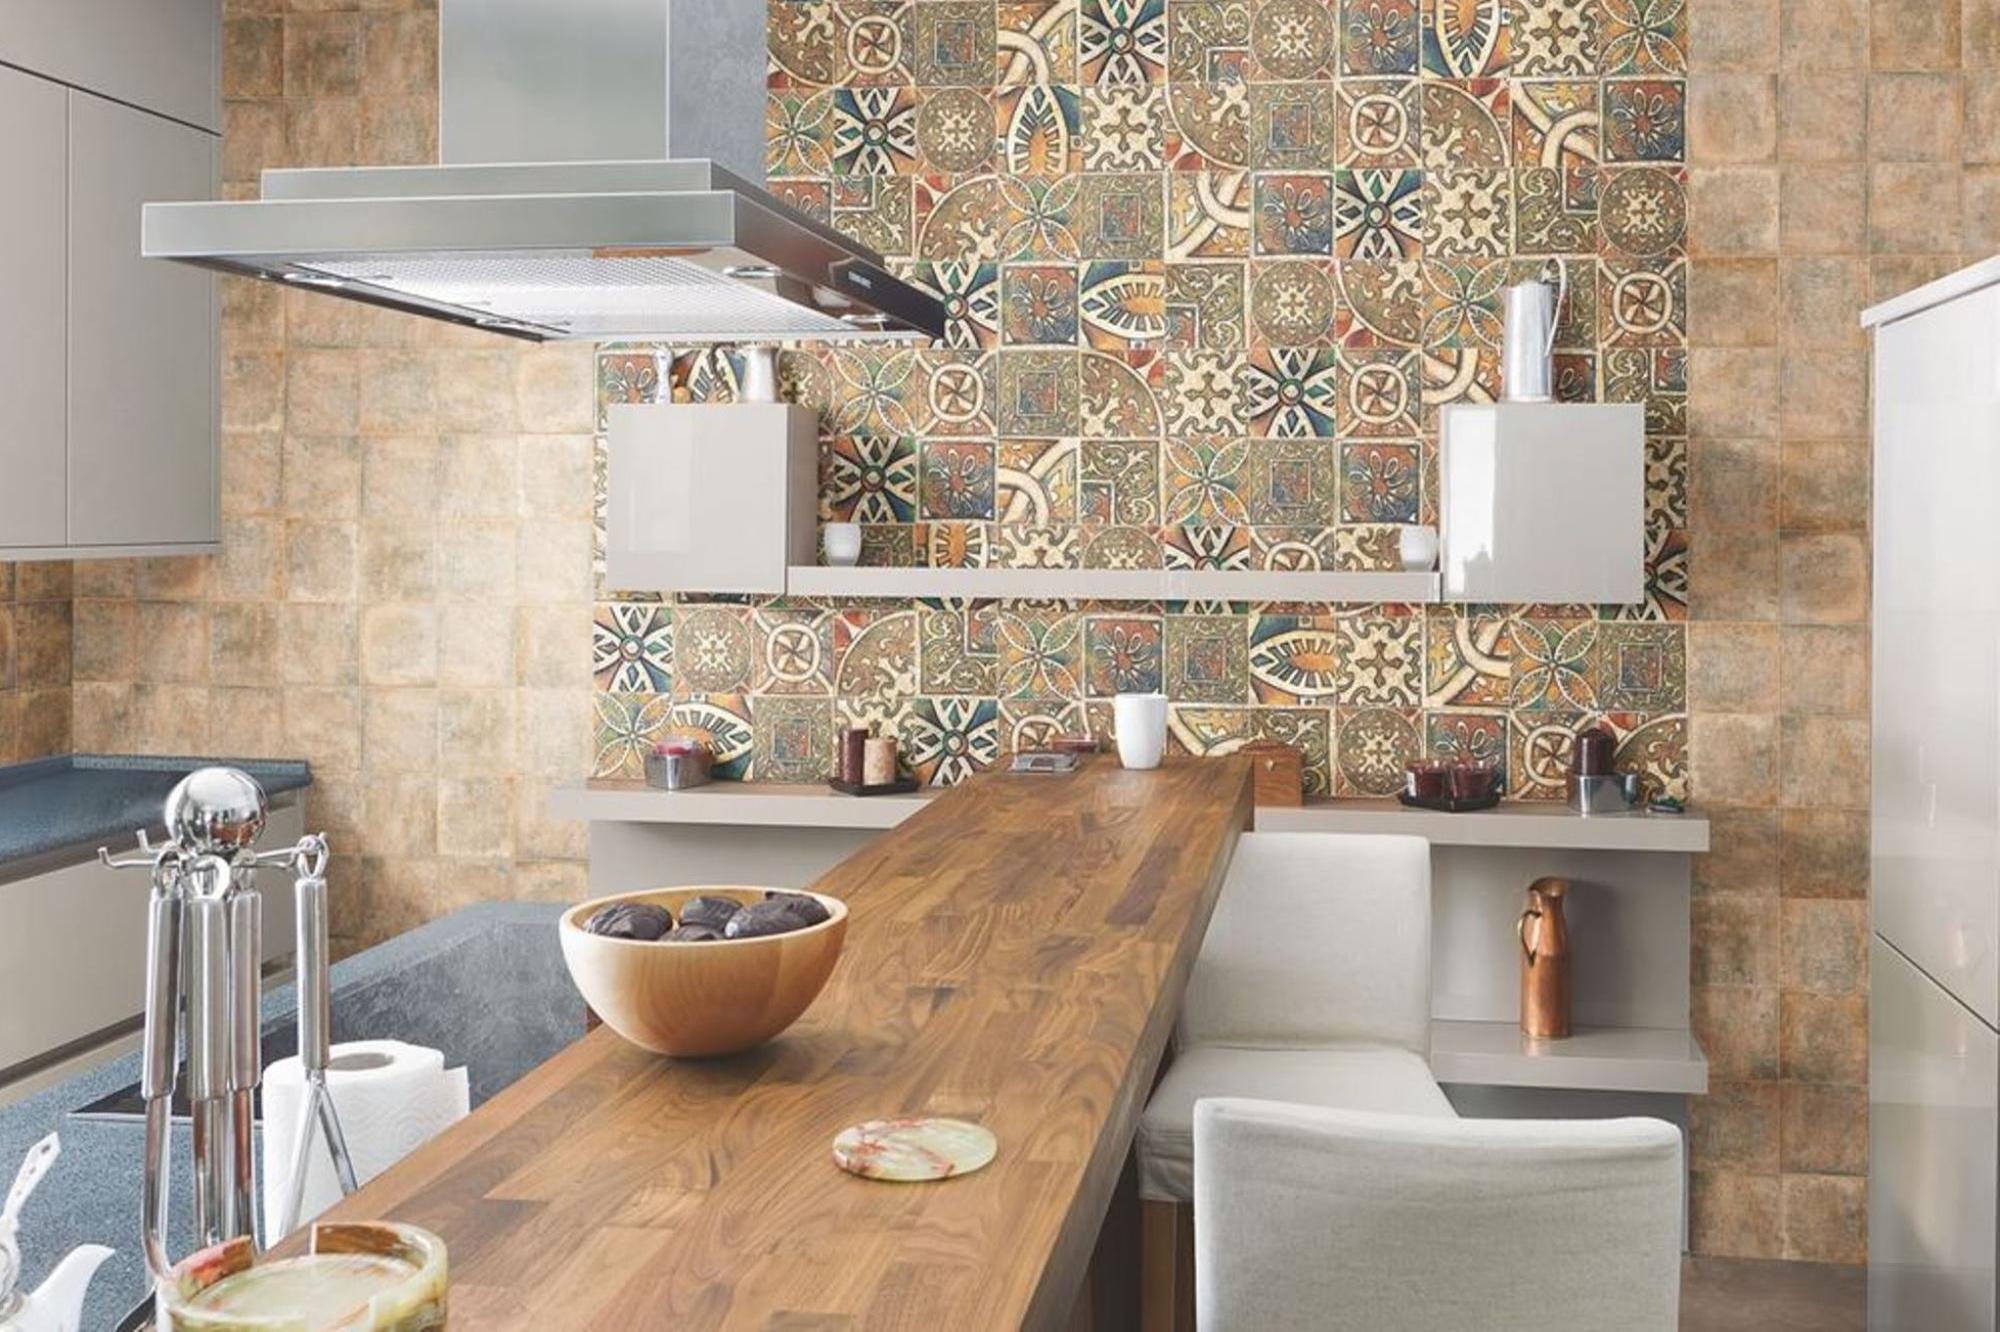 Испанская плитка - лучший вариант отделки стен